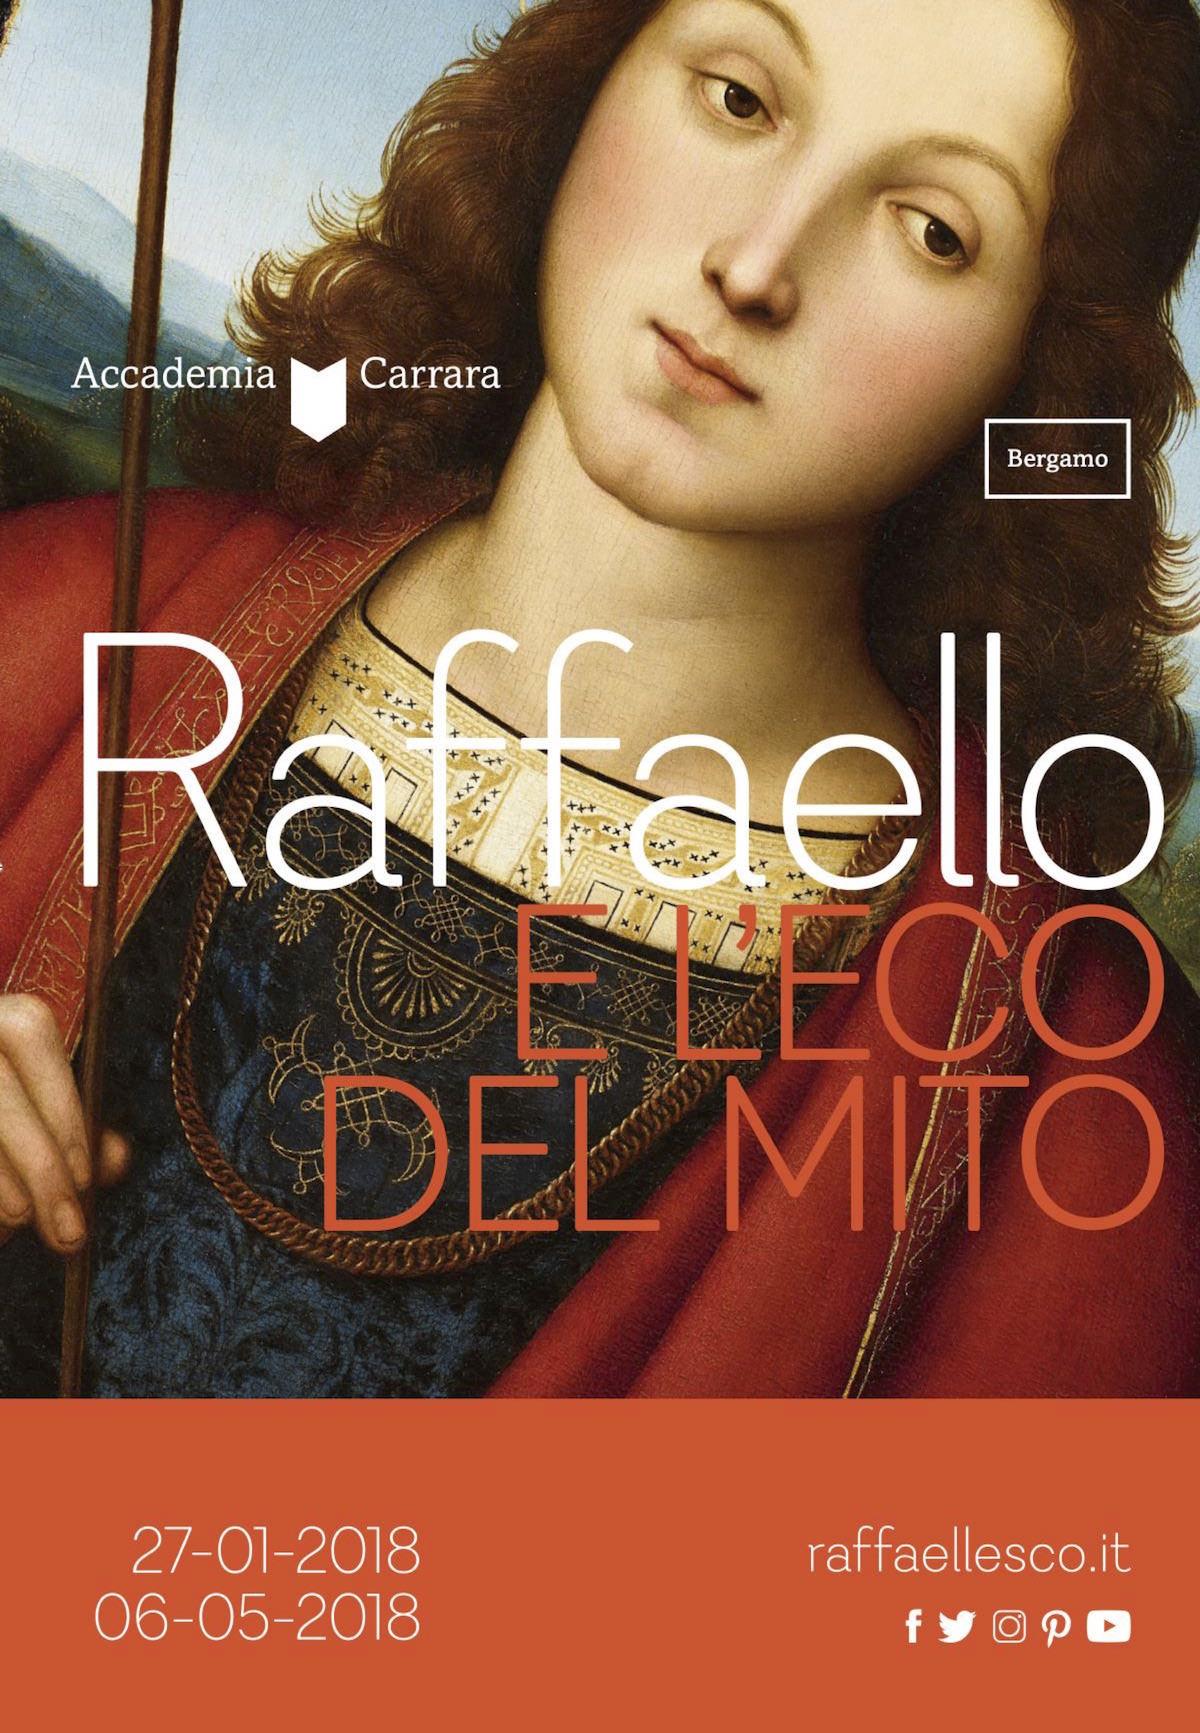 Raffaello_Bergamo